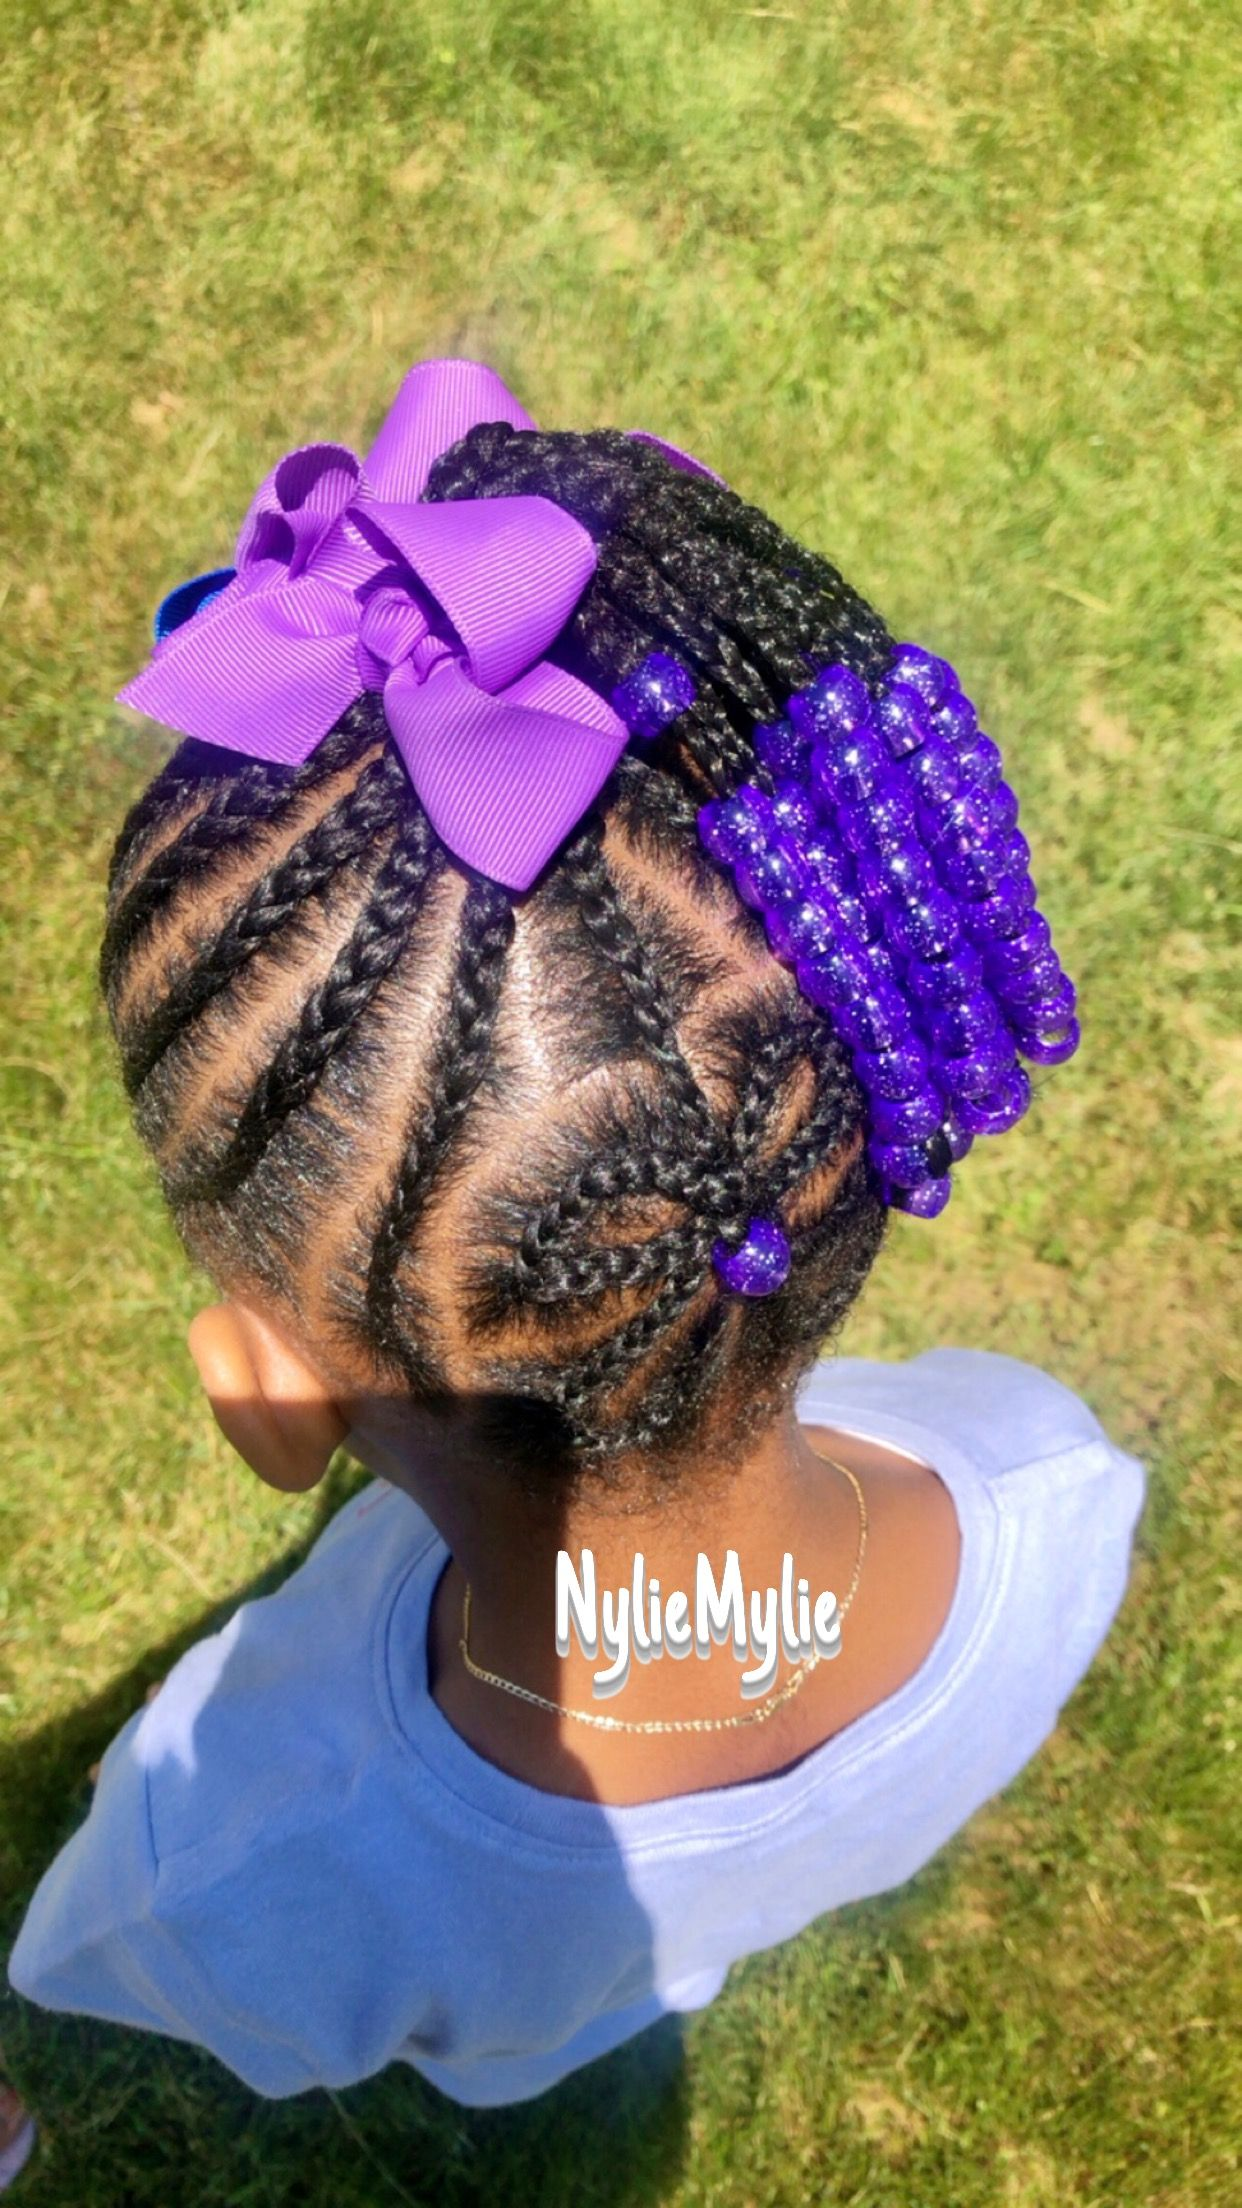 #blackhairstyles #blackchildrenhaircare #protectivestyles #protectivestyling #protectivestyling #childrenhairstyles #hartford #connecticut